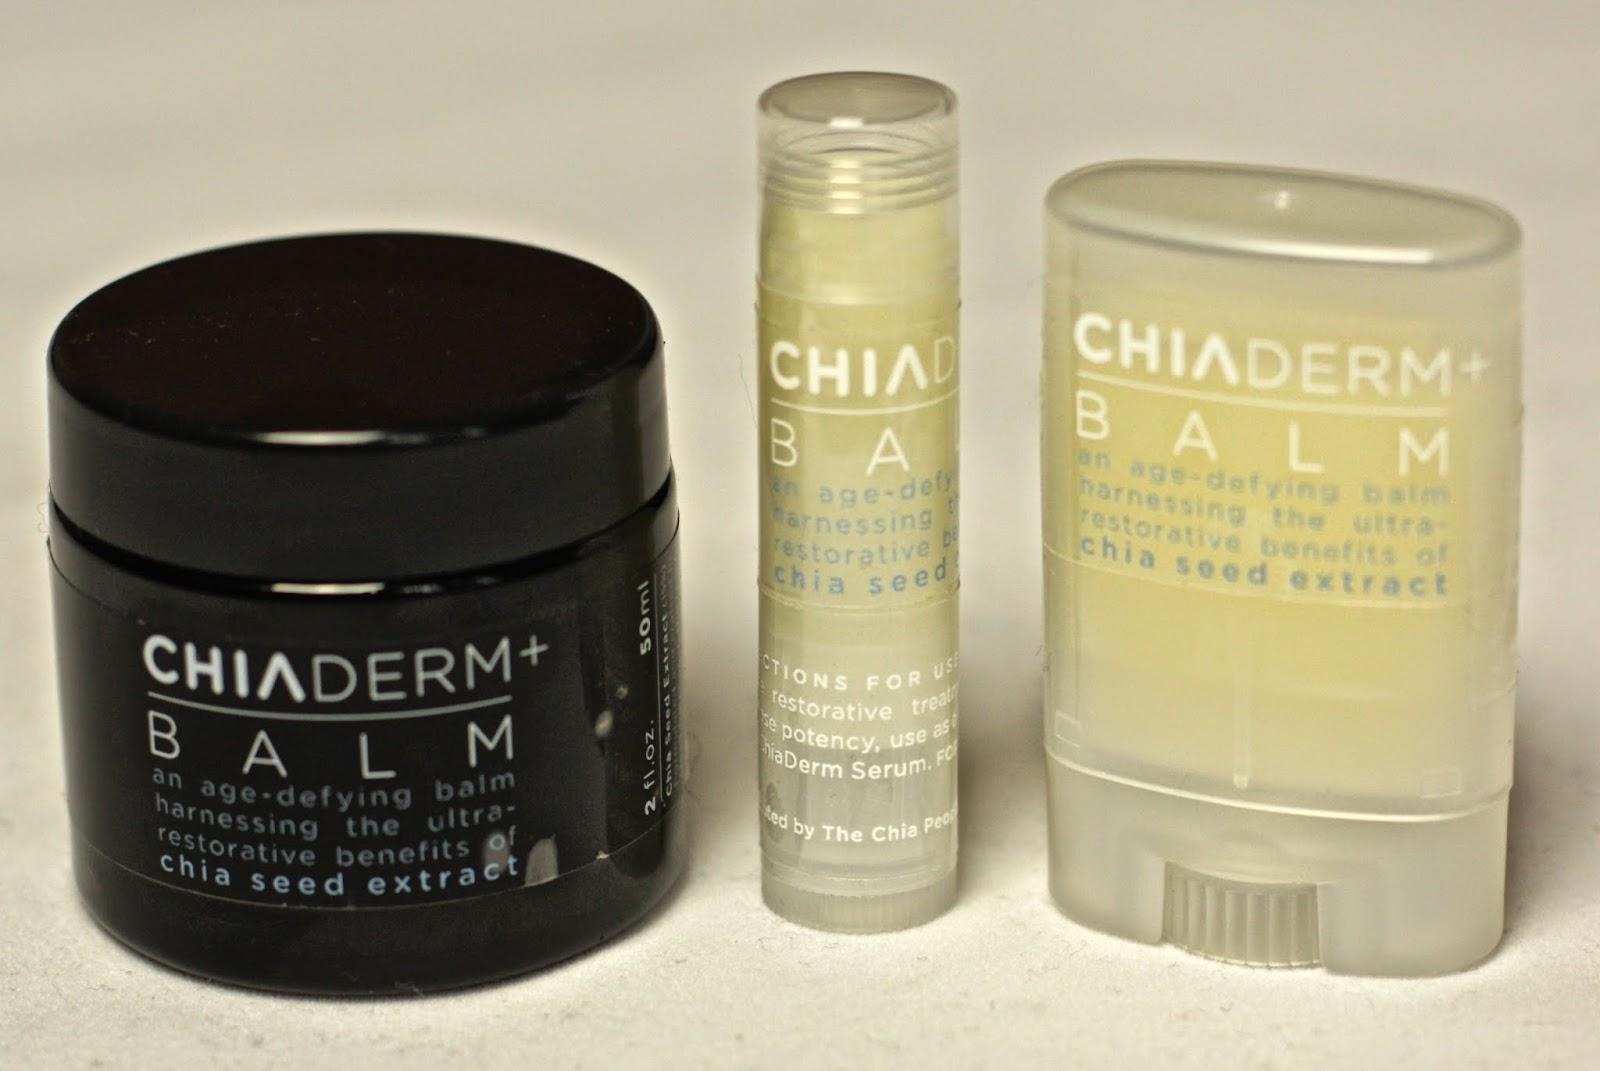 ChiaDerm+ lip balms with chia seeds